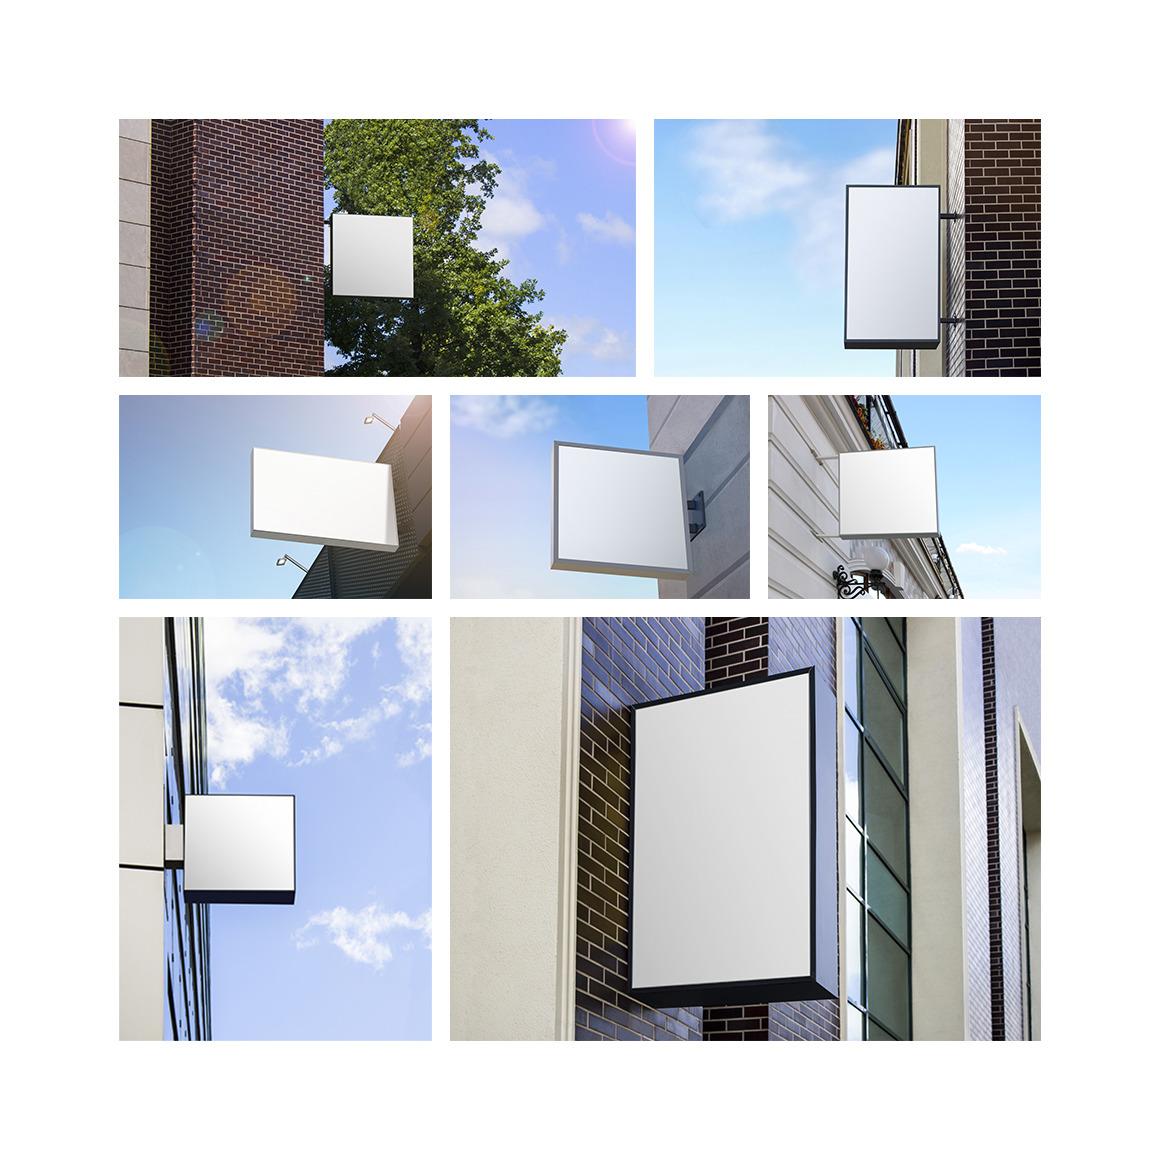 Download 3d Glass Window Logo Mockup Free Psd PSD - Free PSD Mockup Templates